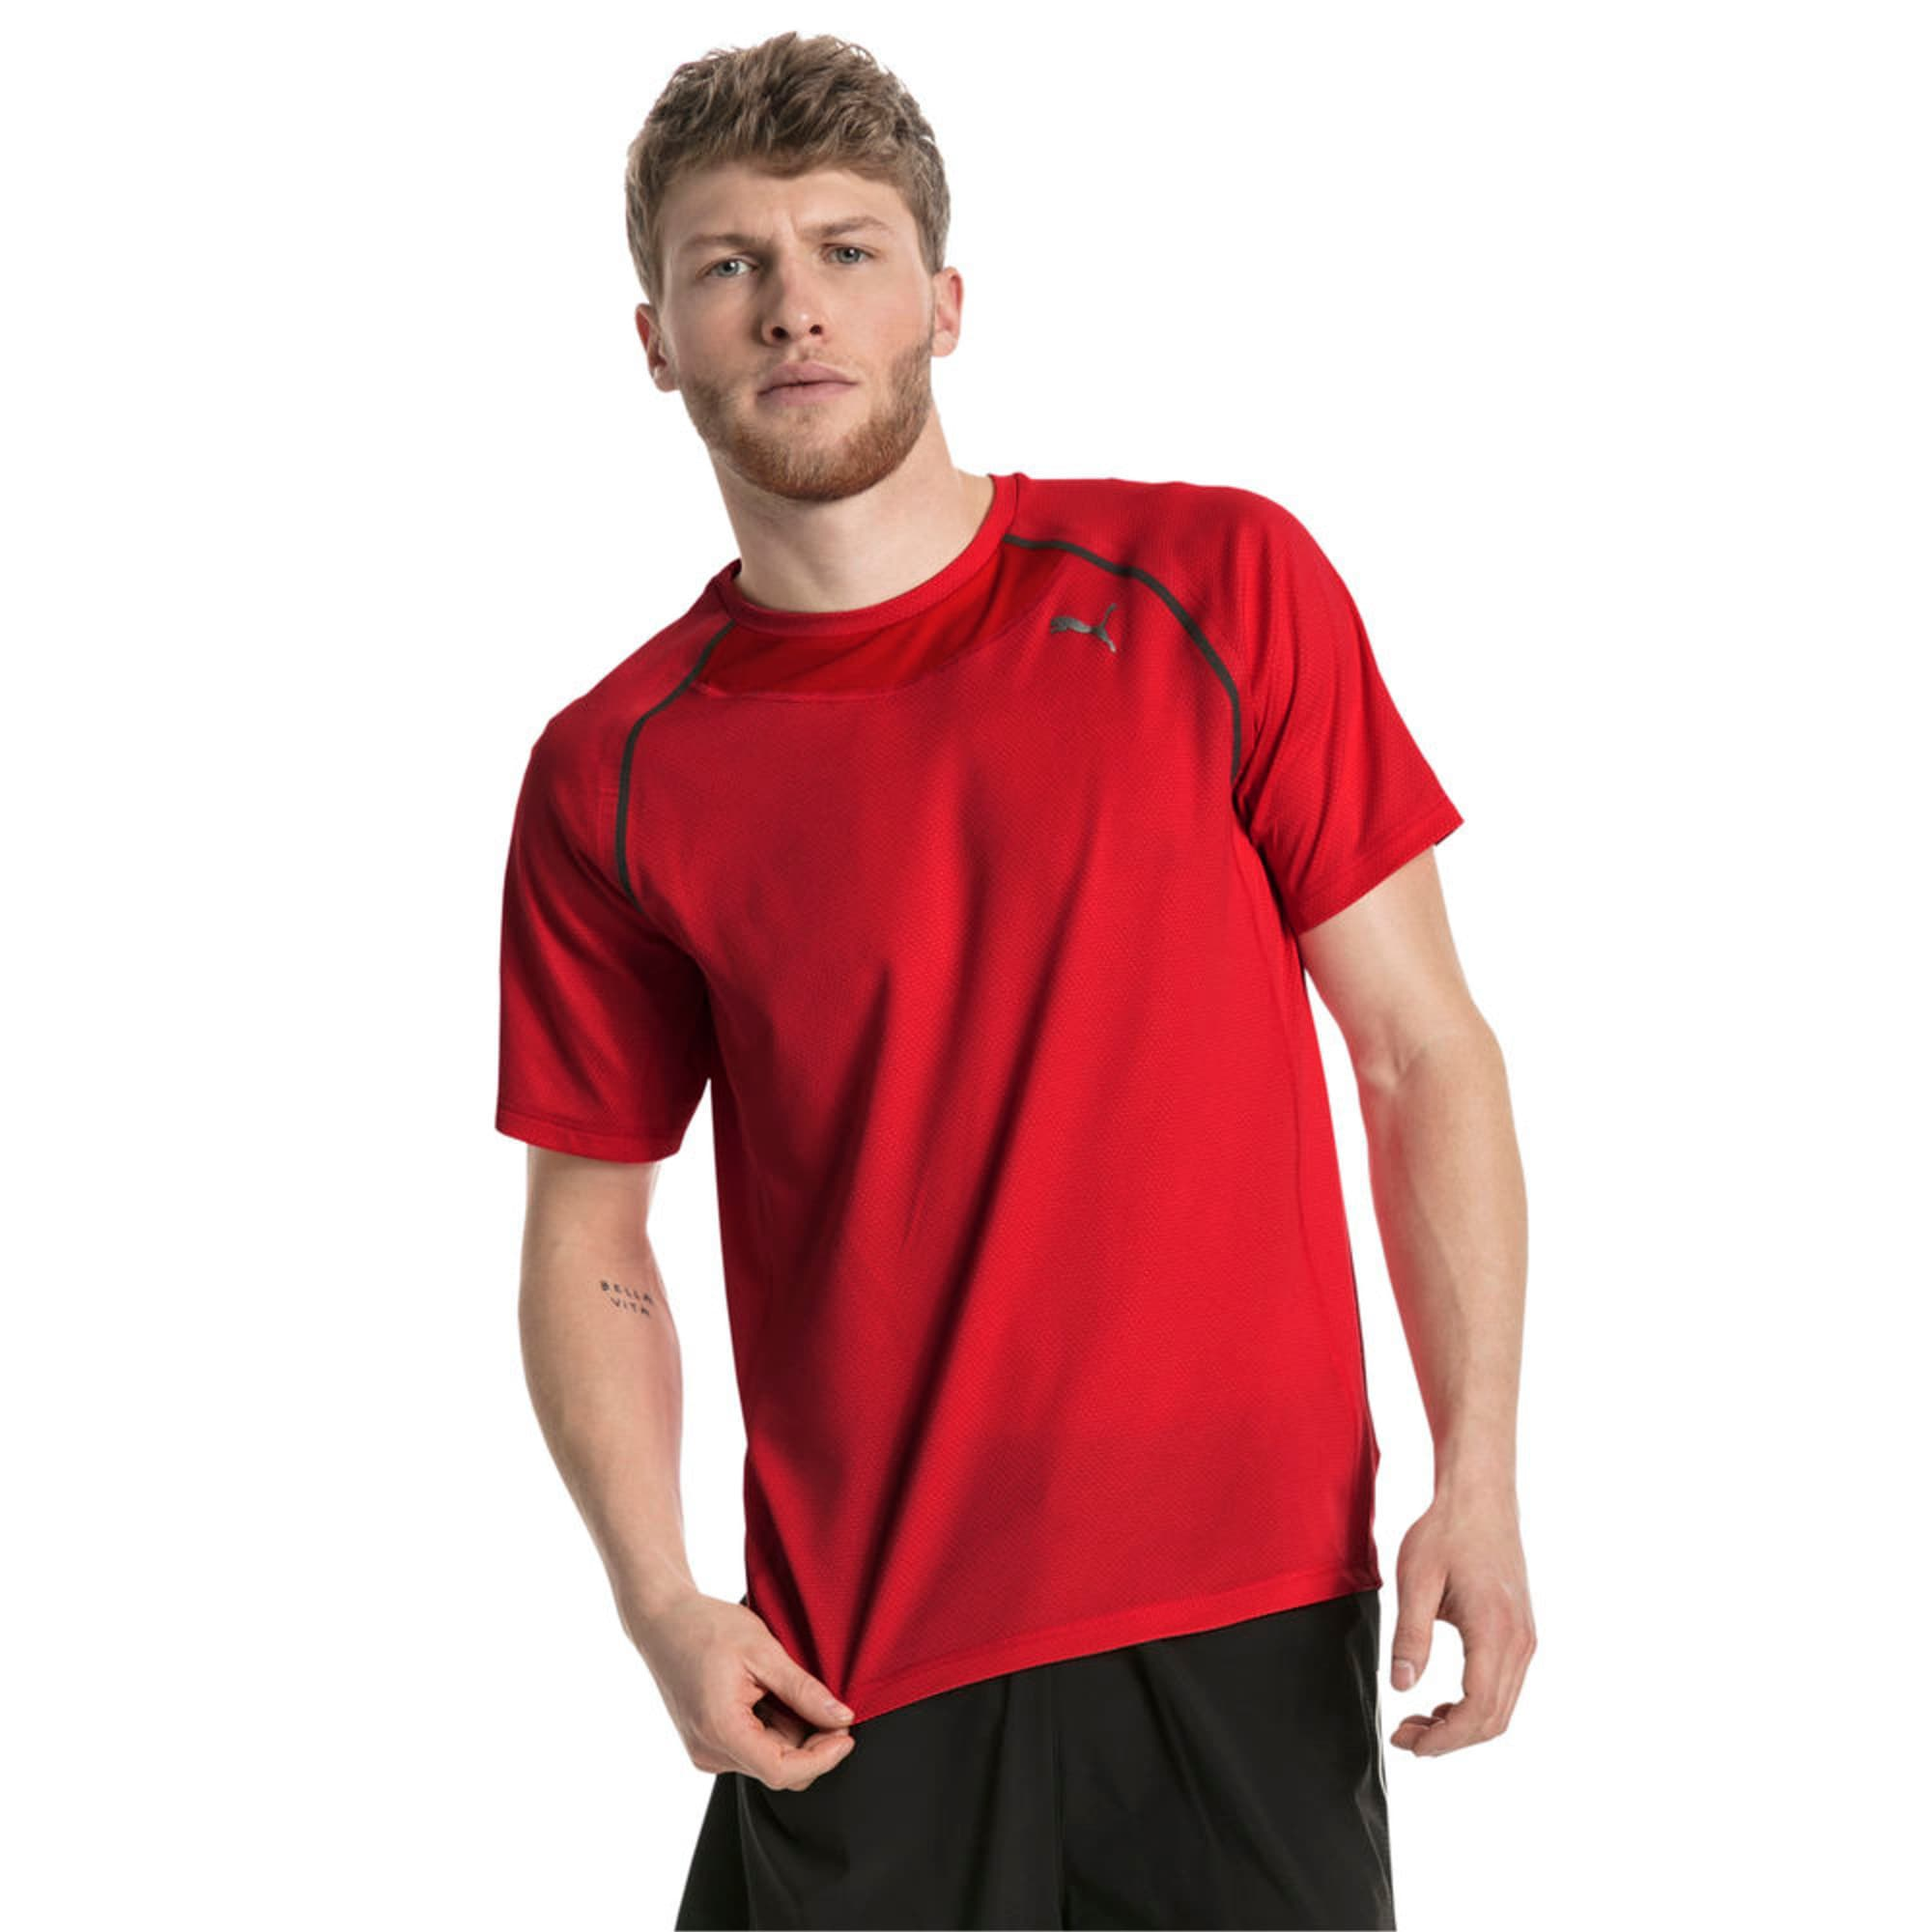 Thumbnail 2 of PWRRUN AdapThermo-R Men's Short Sleeve Running T-Shirt, Flame Scarlet, medium-IND